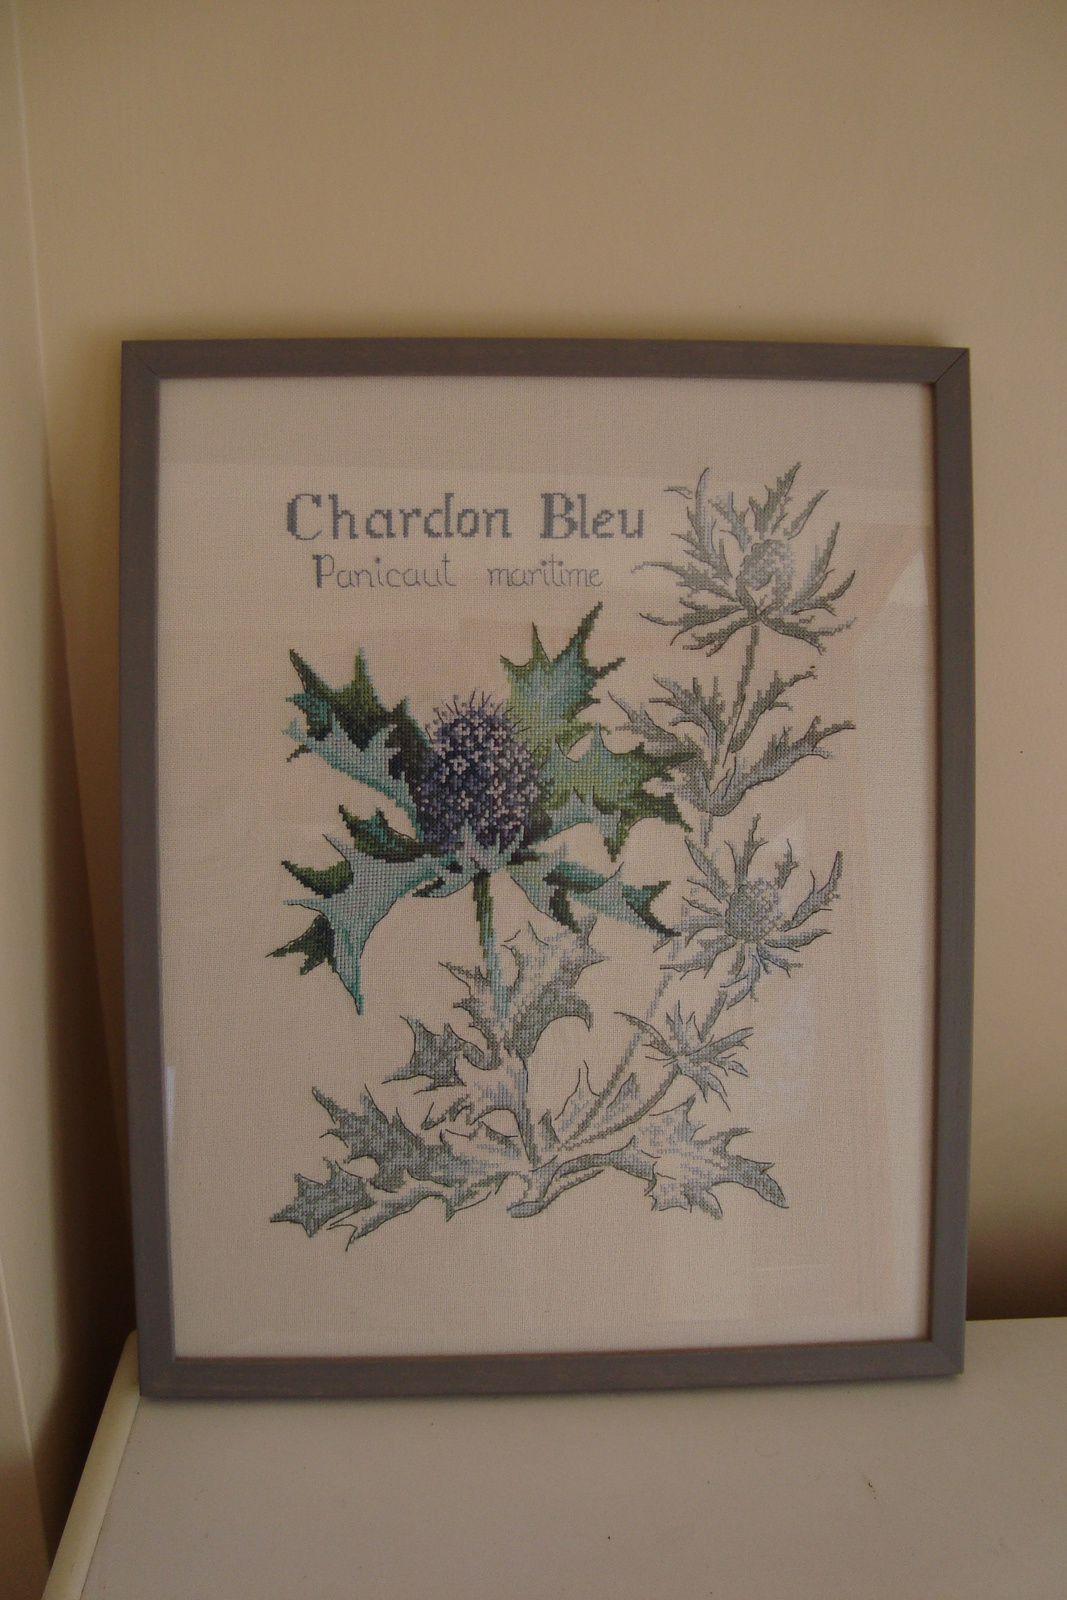 Broderie le chardon bleu